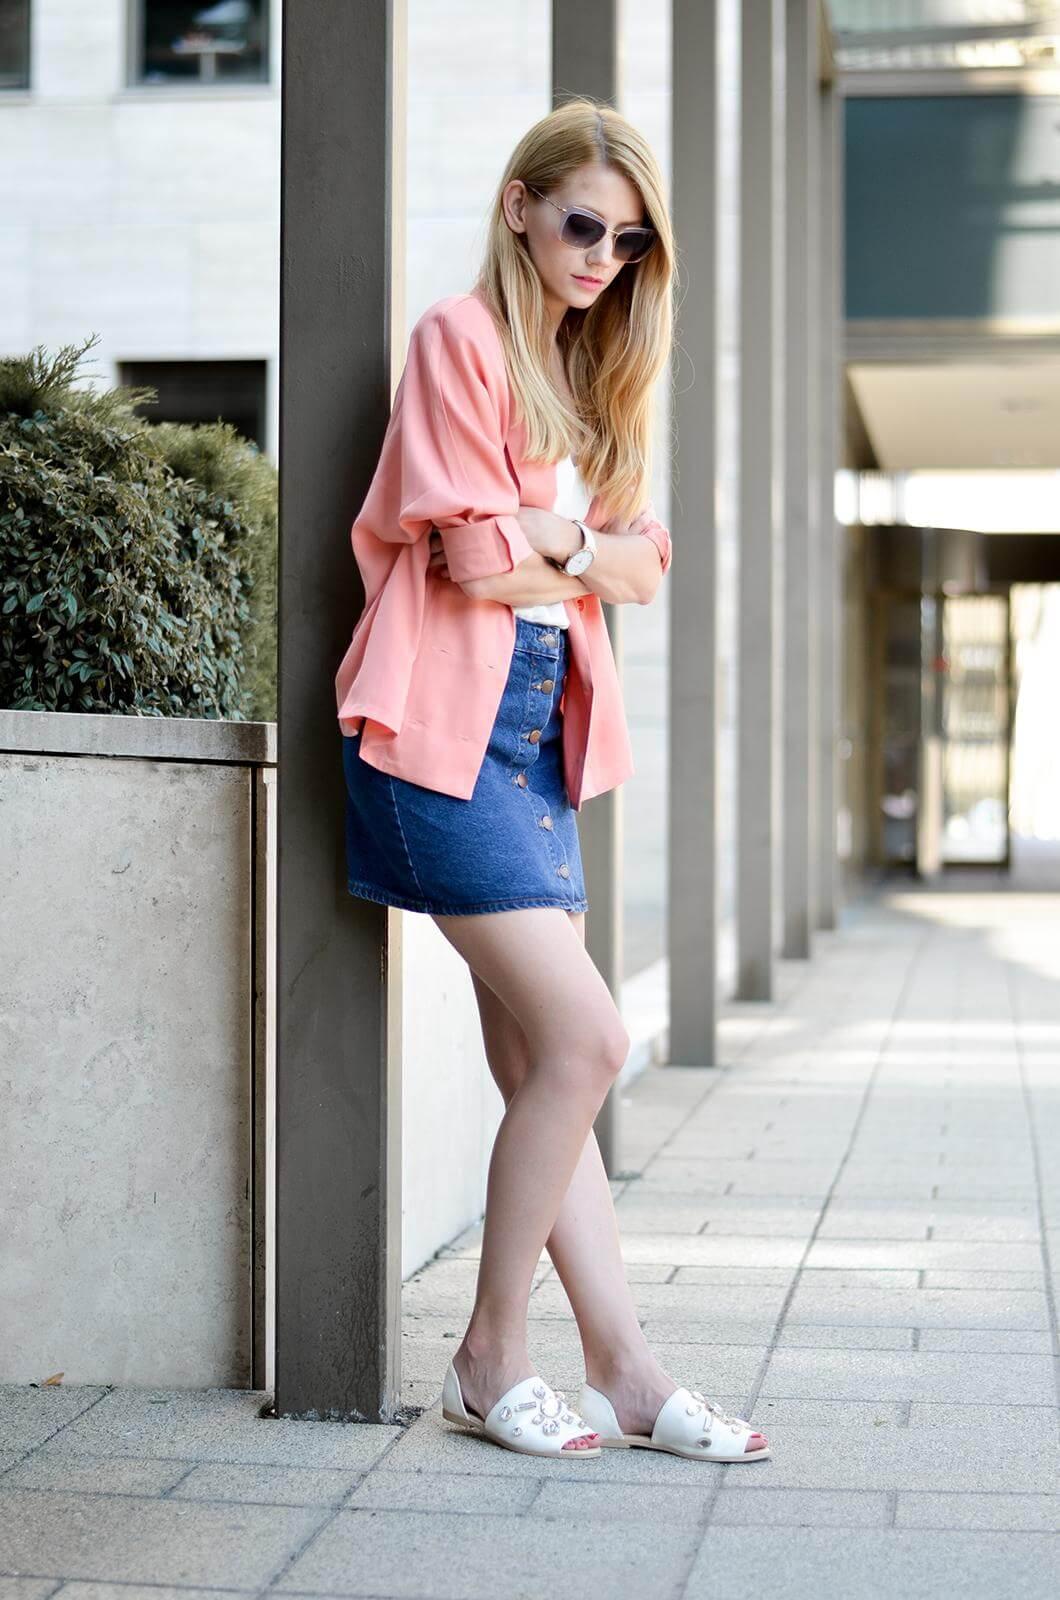 Miu_Miu_outfit_ streetstyle_8